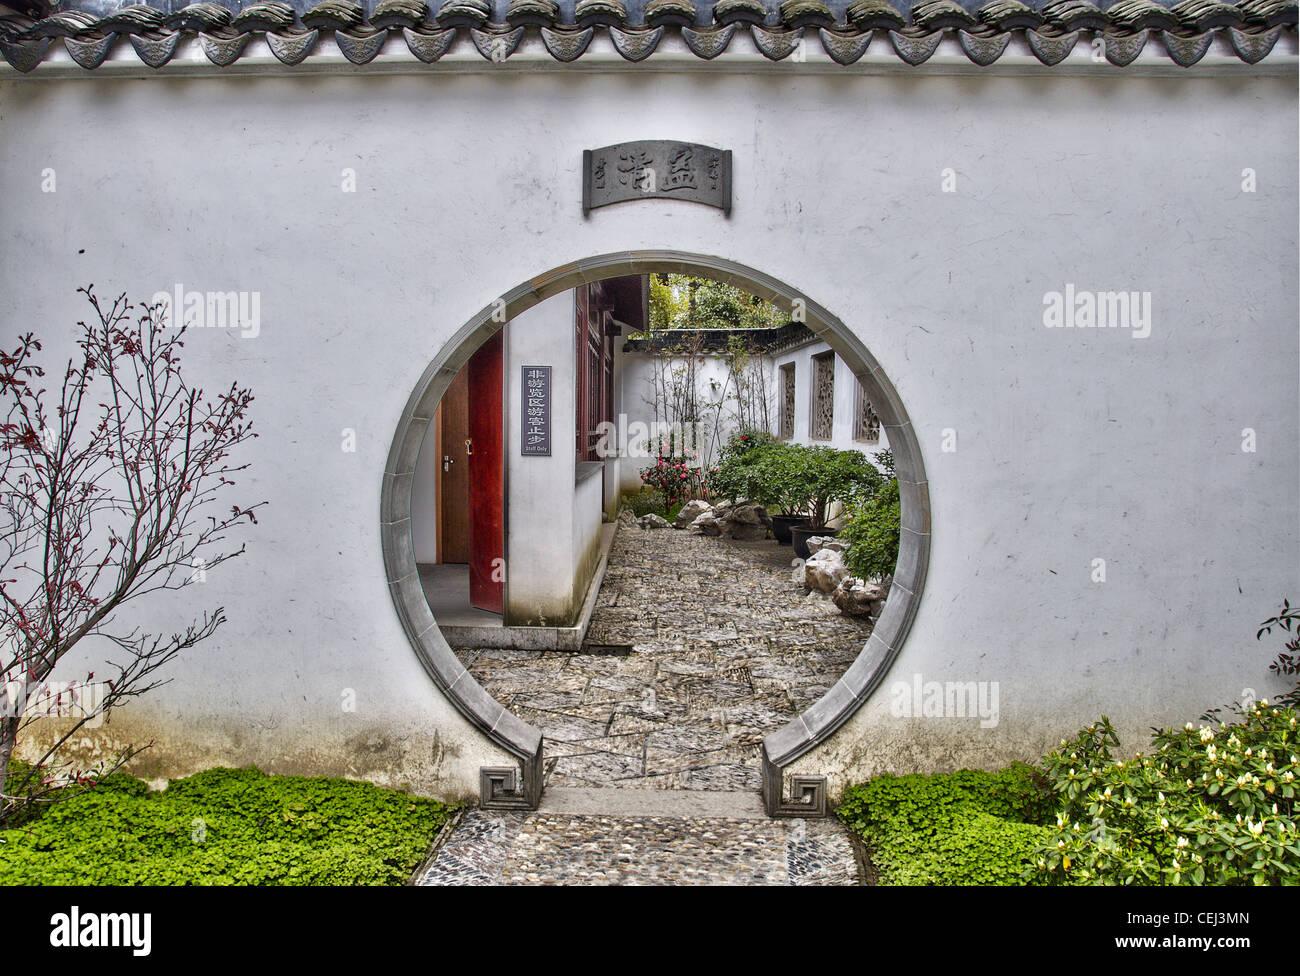 A round door at Humble administrator's garden - Suzhou (china) - Stock Image